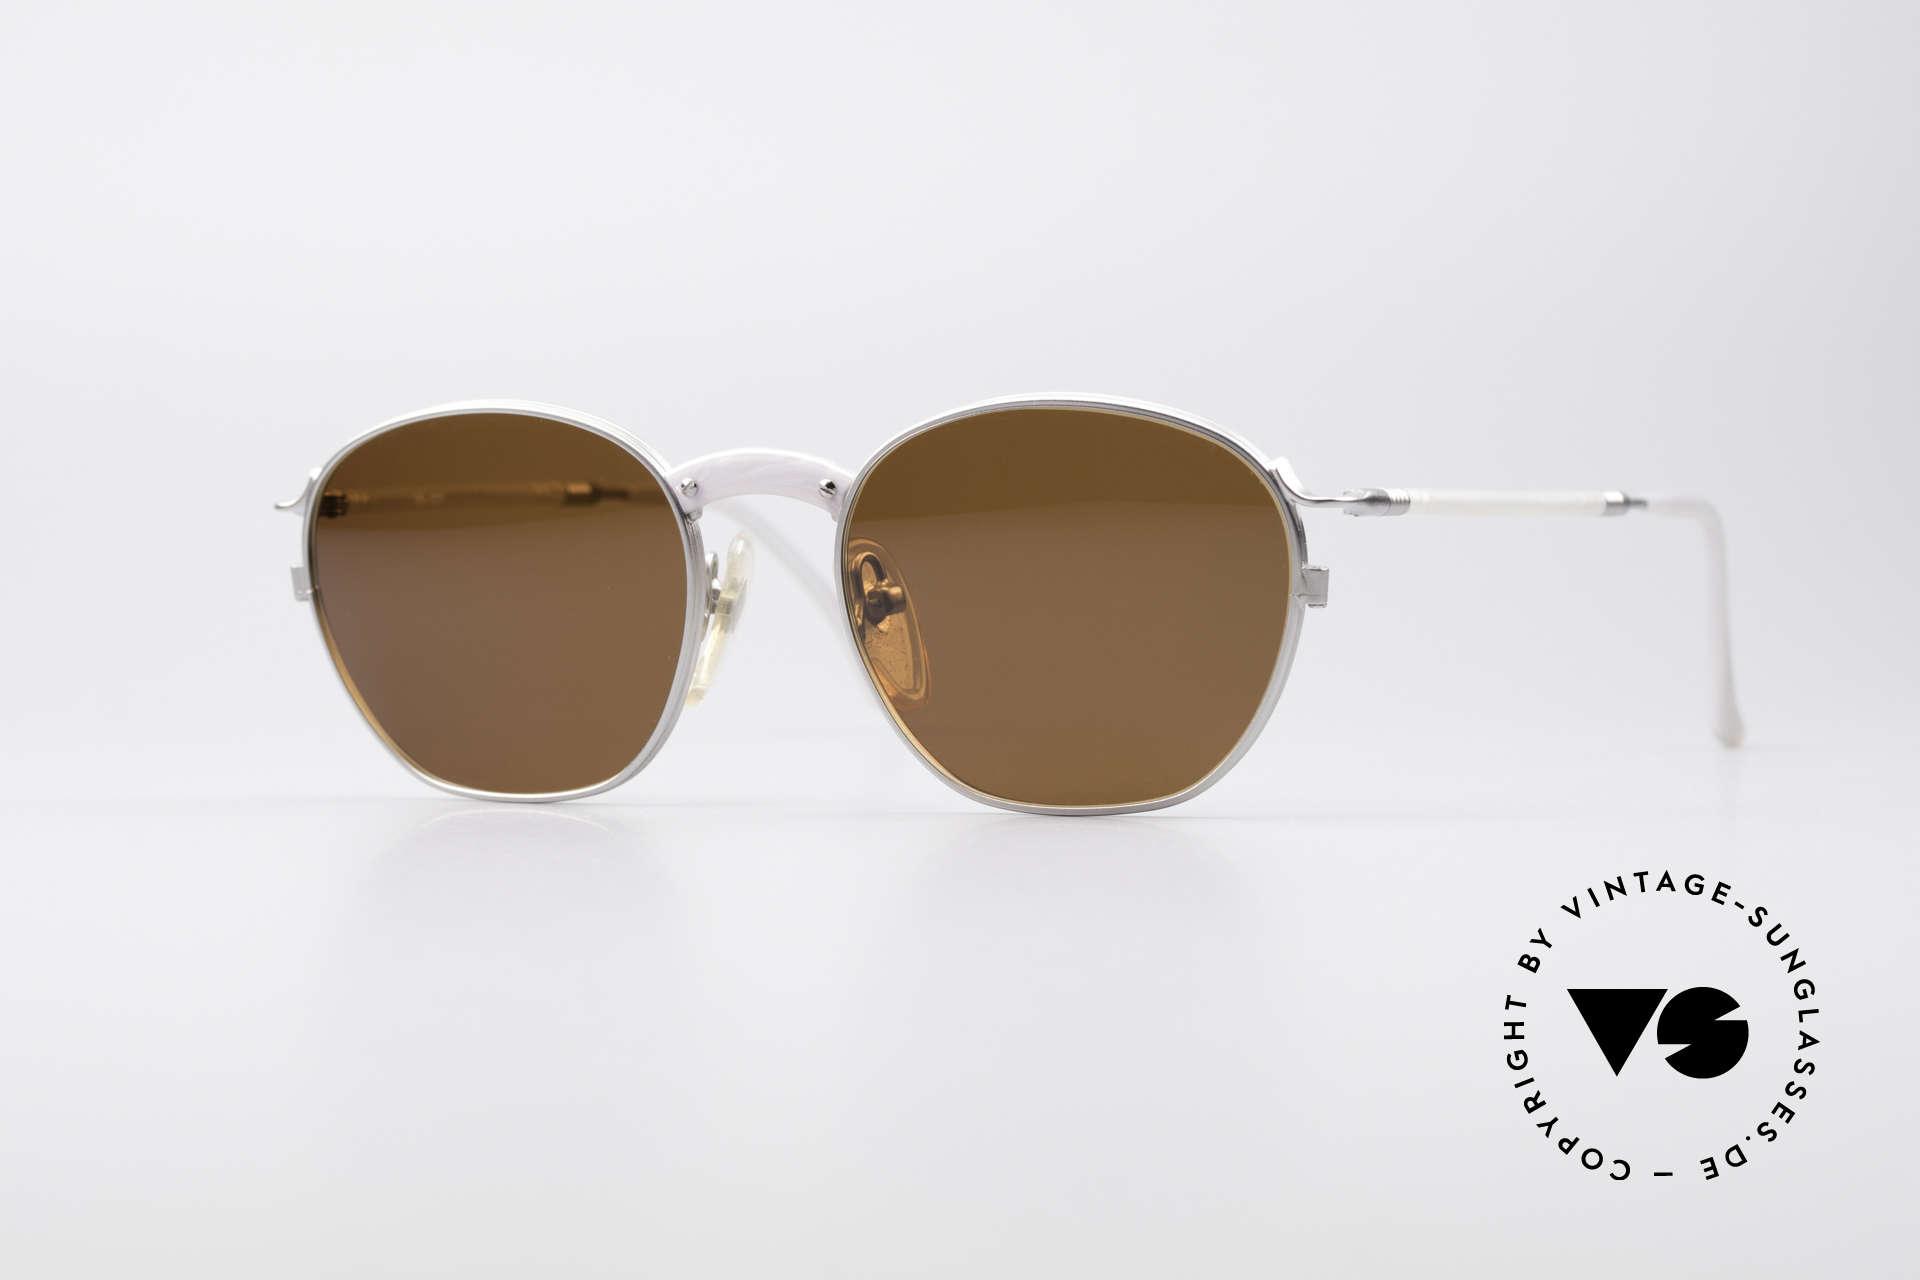 Jean Paul Gaultier 55-1271 JPG Vintage Sunglasses, vintage designer sunglasses by Jean Paul GAULTIER, Made for Men and Women